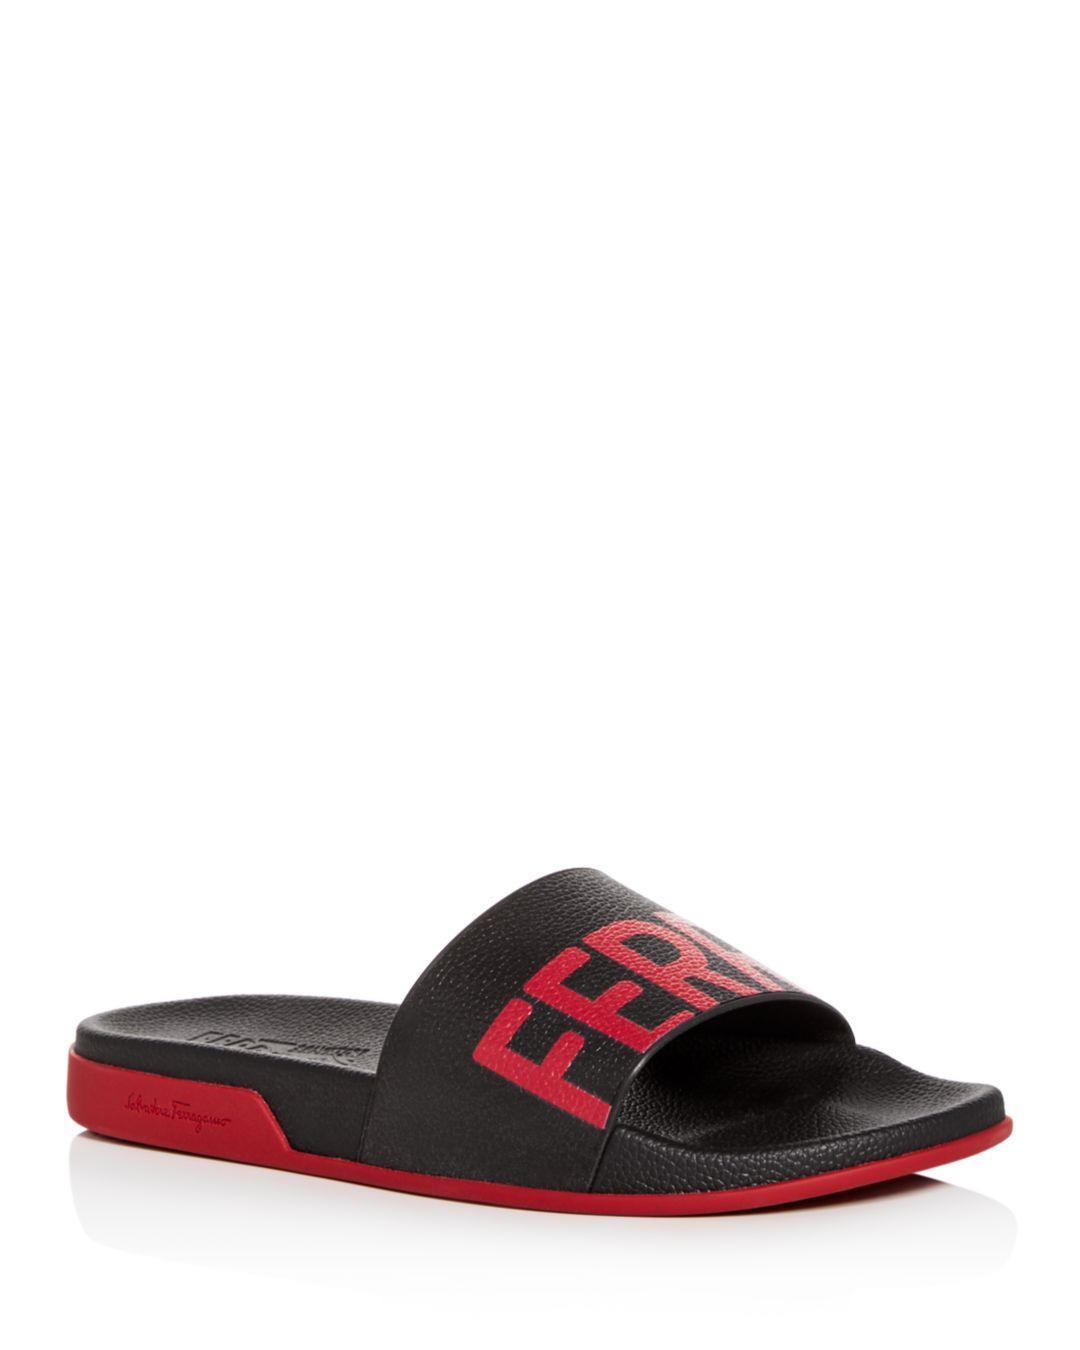 4d212f5f8edc Lyst - Ferragamo Men s Amos Slide Sandals in Black for Men